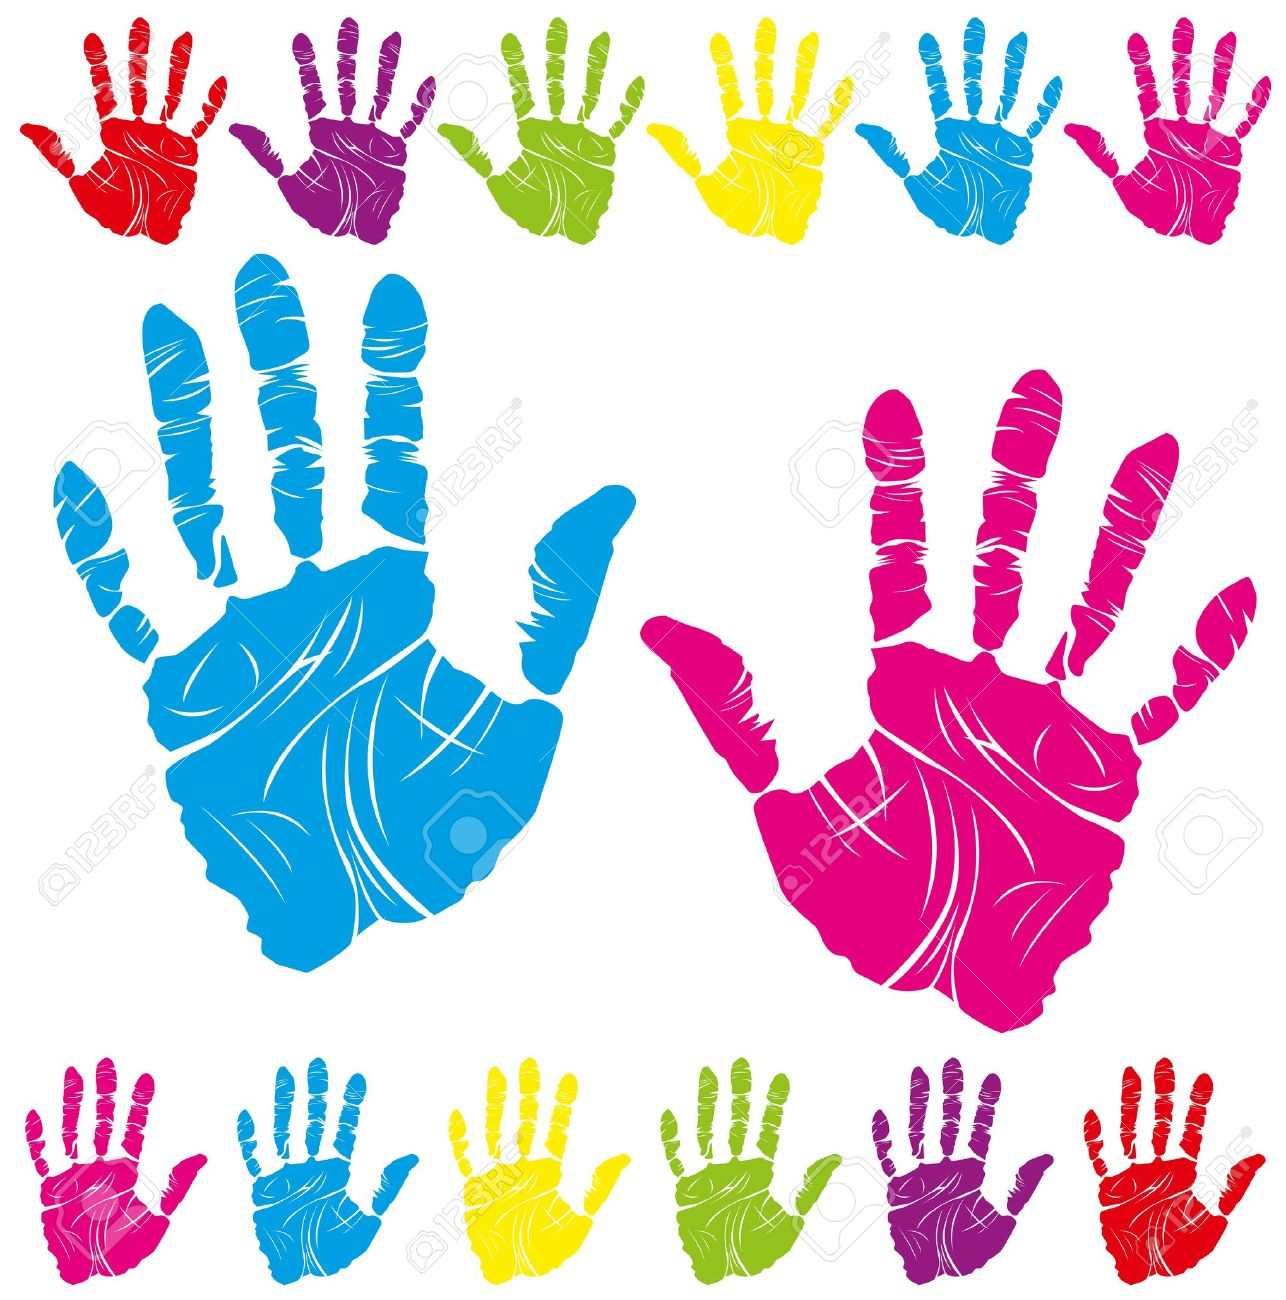 Baby Handprint Vector - More information